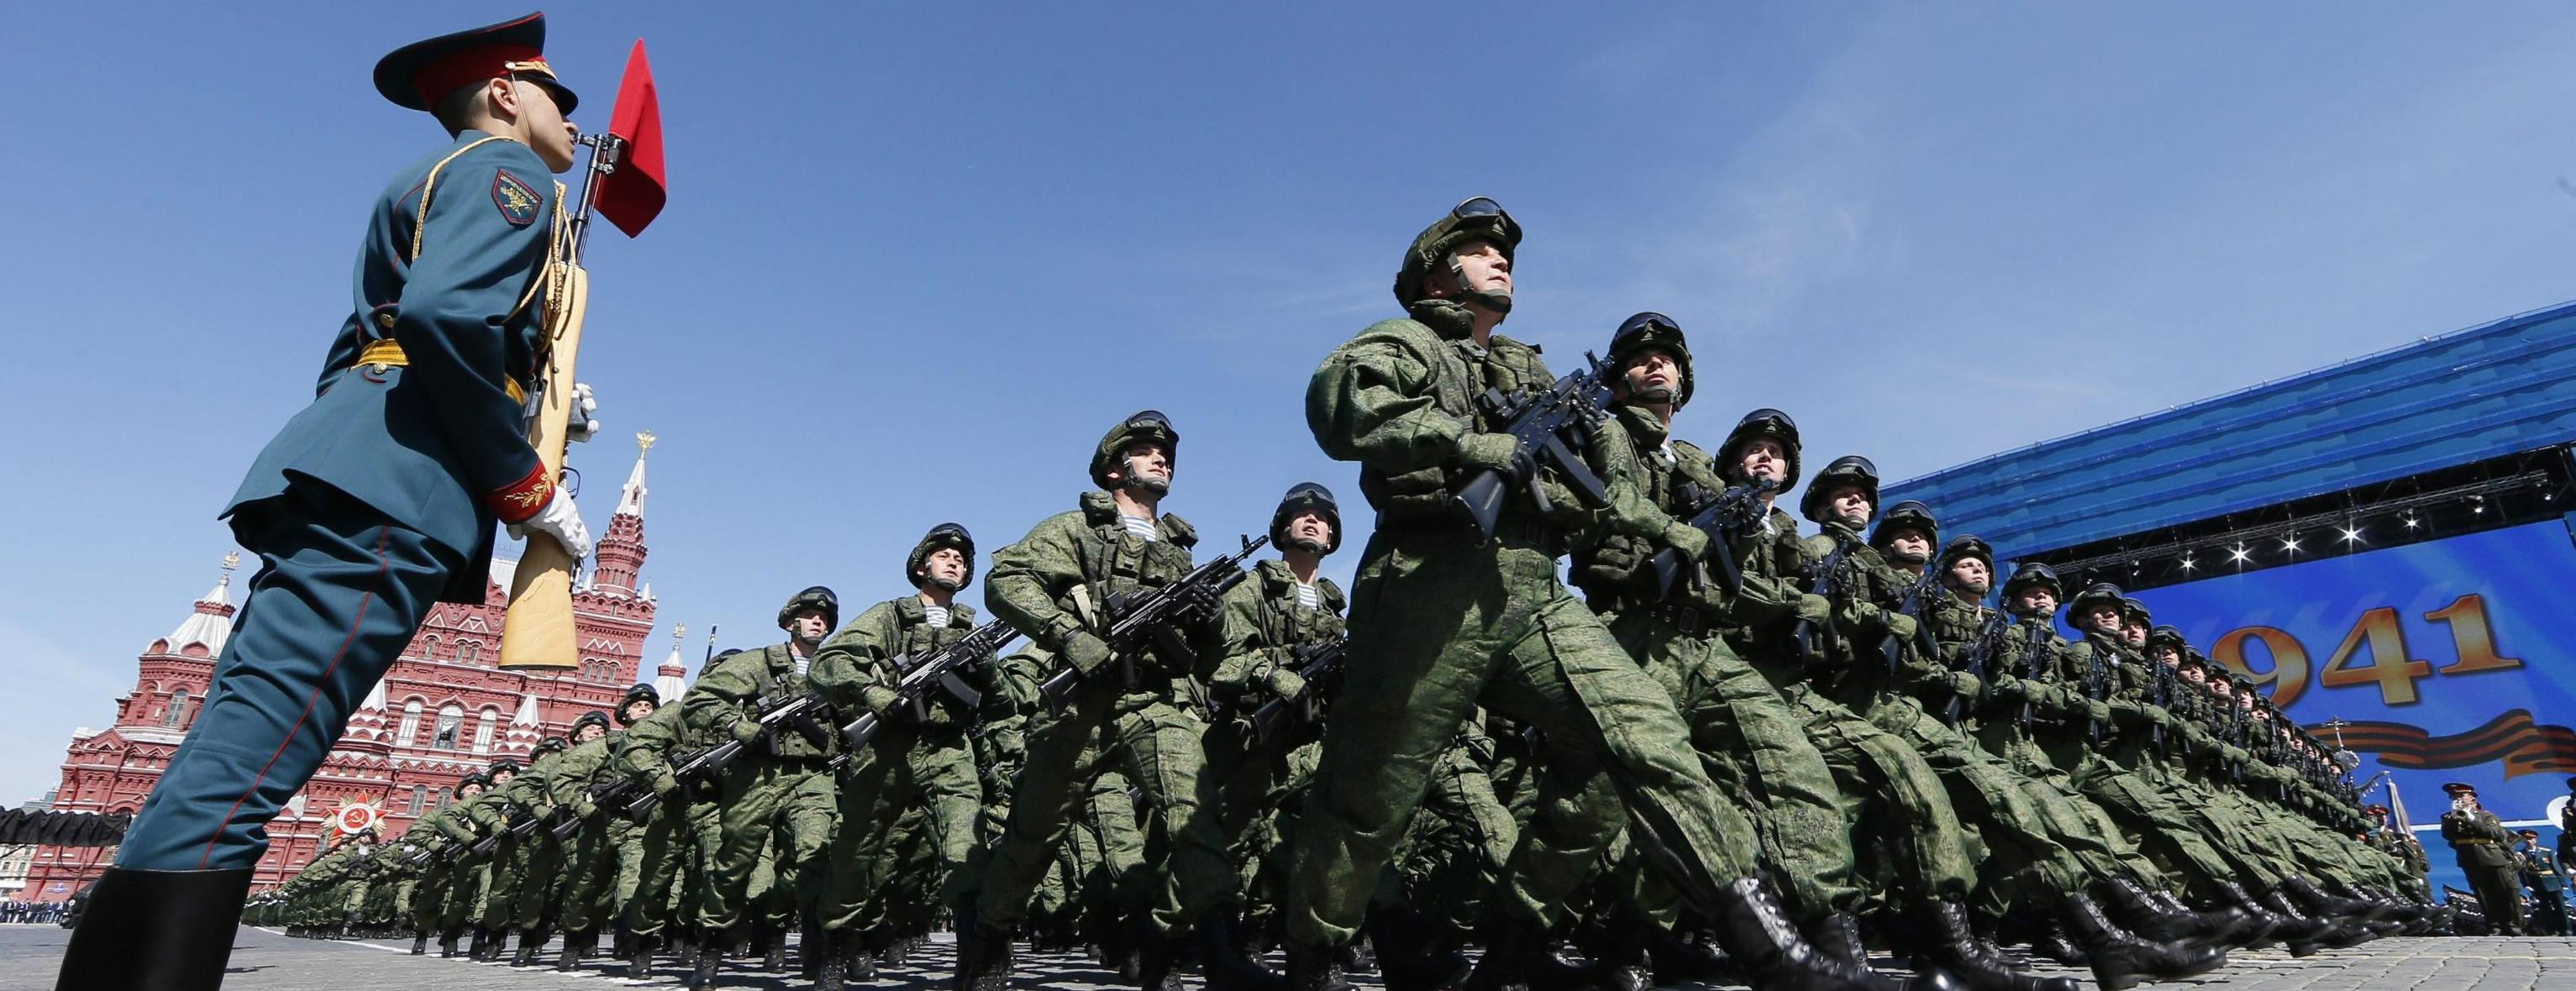 Una parata militare a Mosca